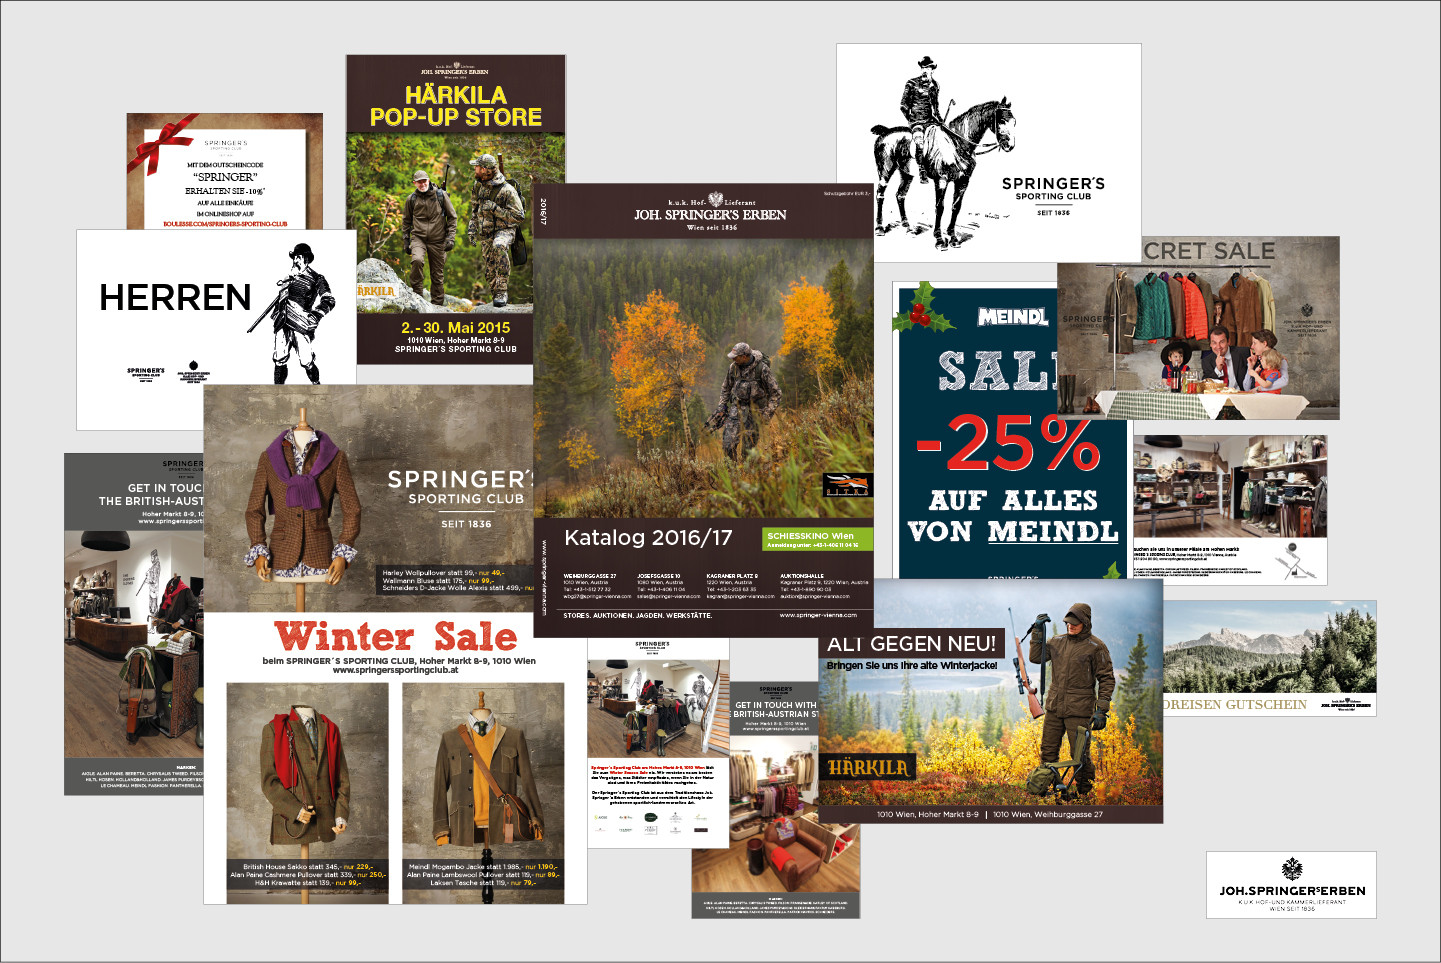 JOH. SPRINGER´S ERBEN Produktfotografie, Immobilienfotografie, Grafik diverse Drucksorten